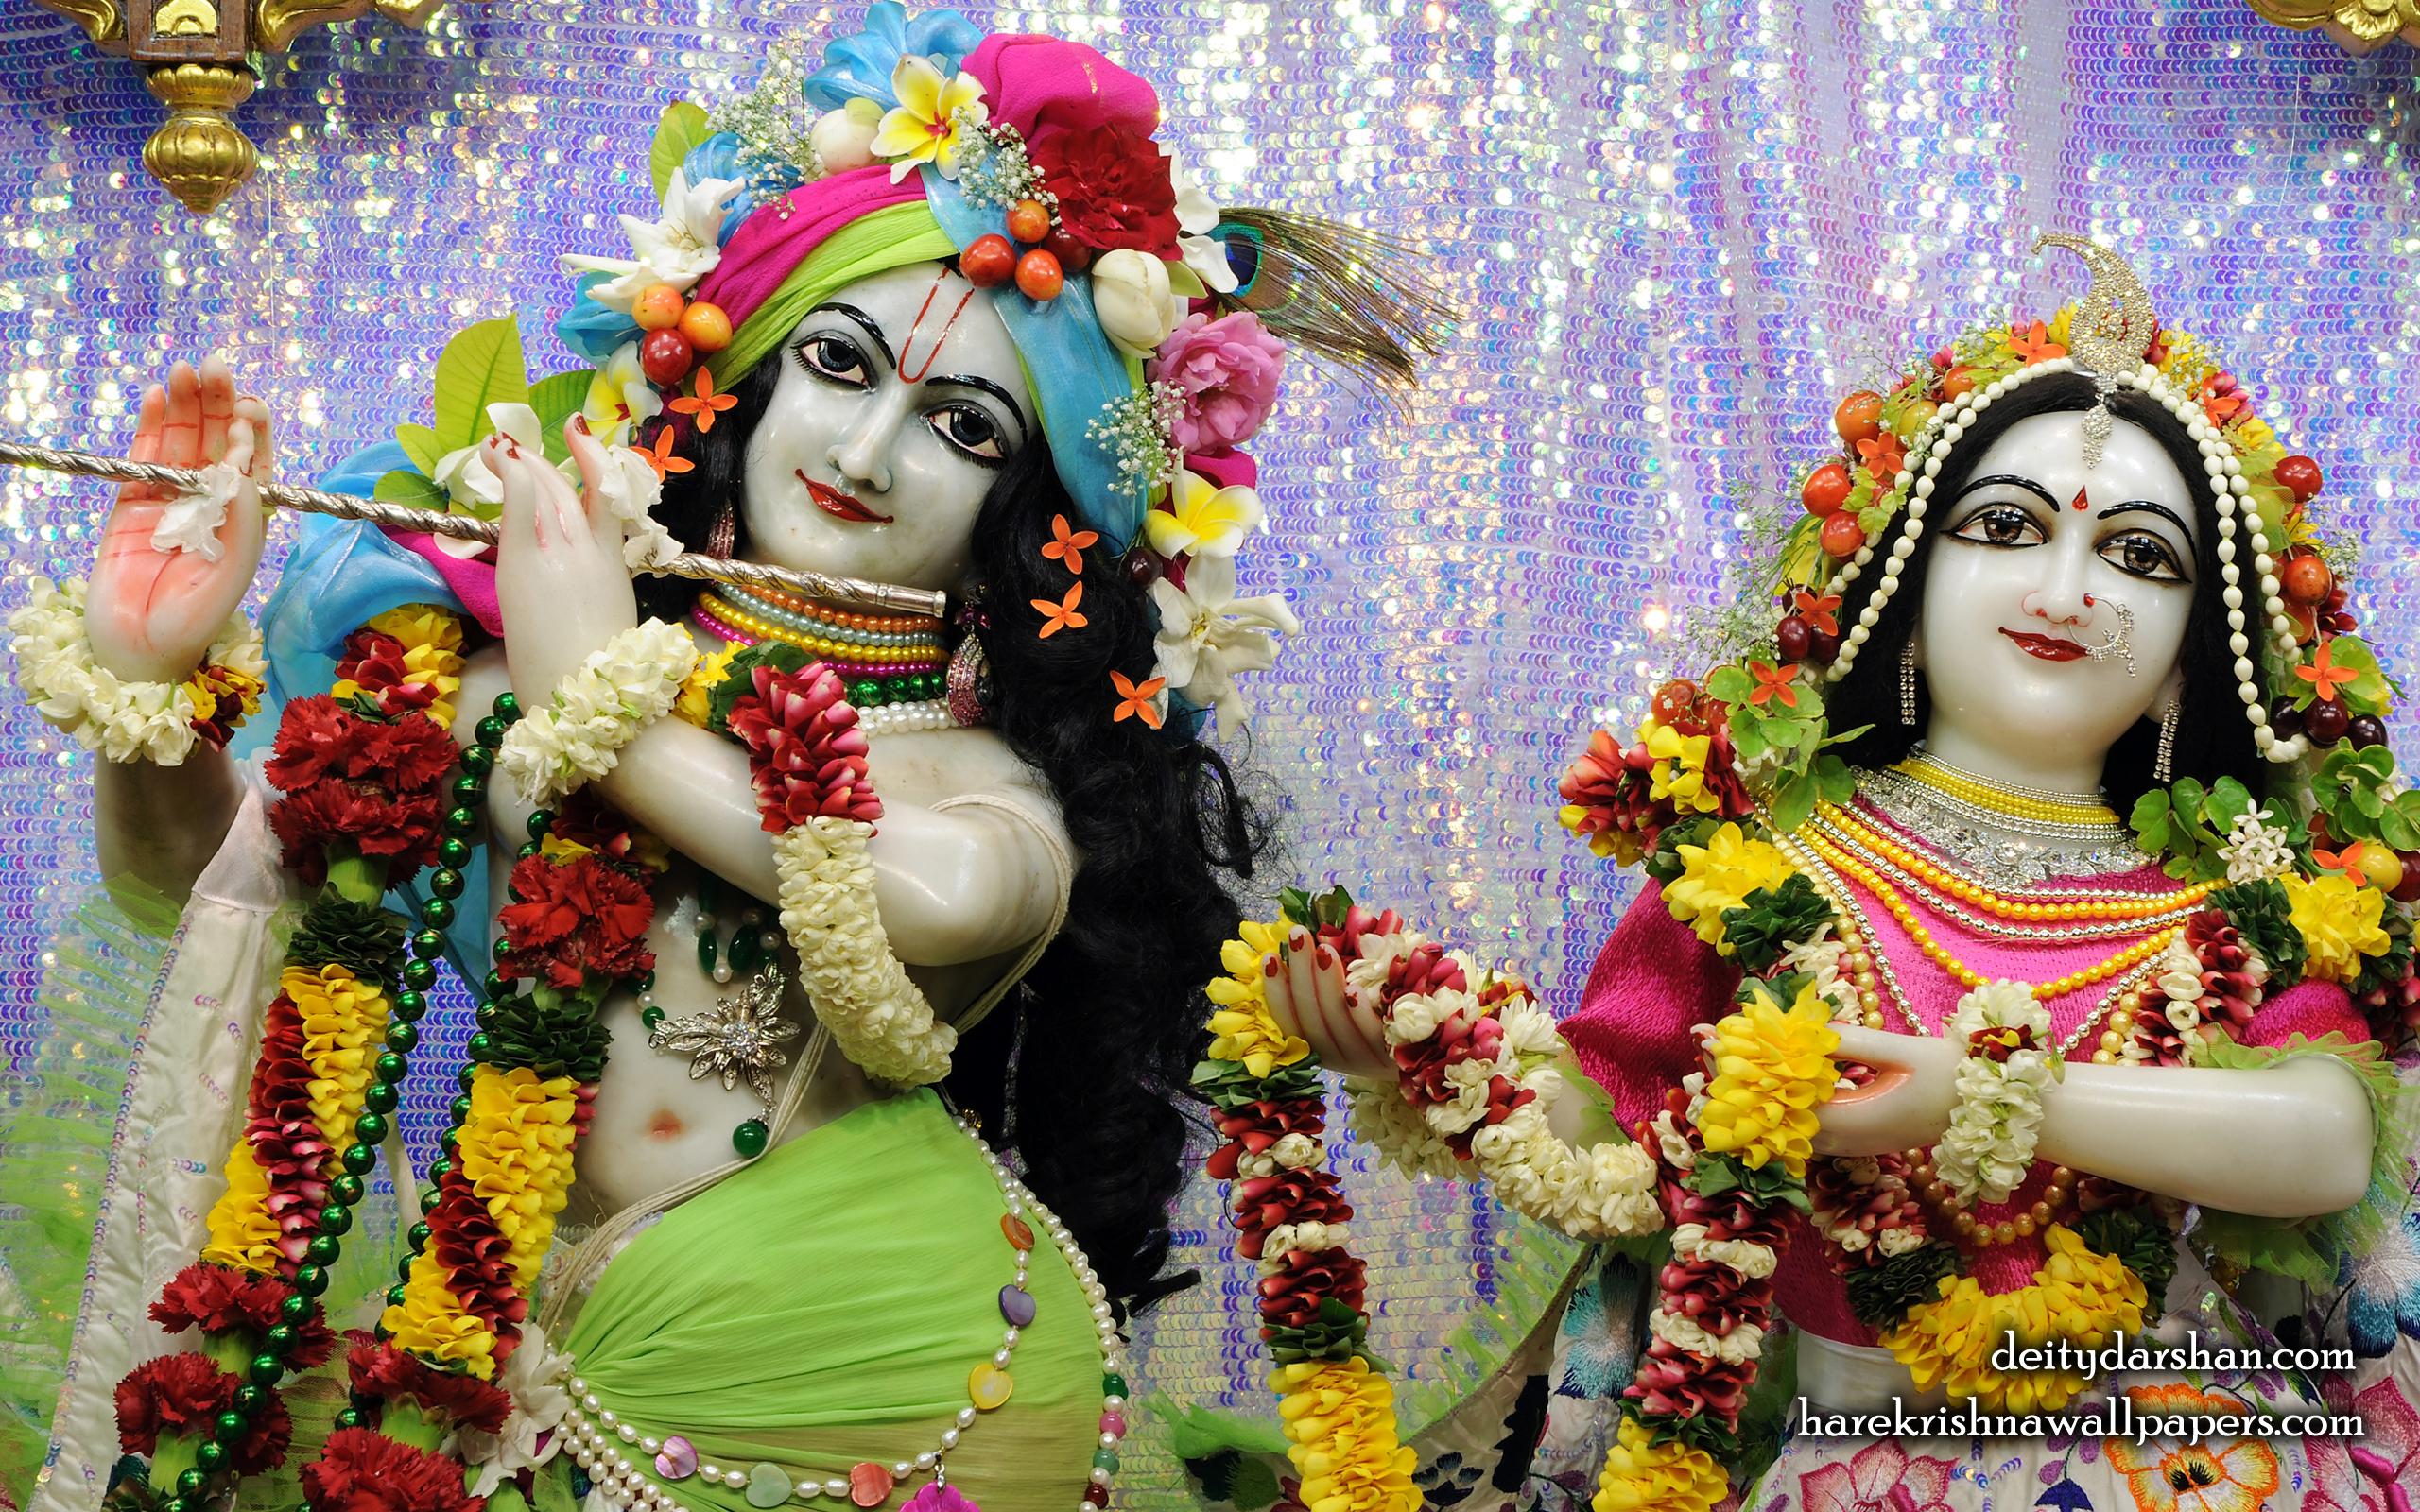 Sri Sri Radha Gopinath Close up Wallpaper (068) Size 2560x1600 Download